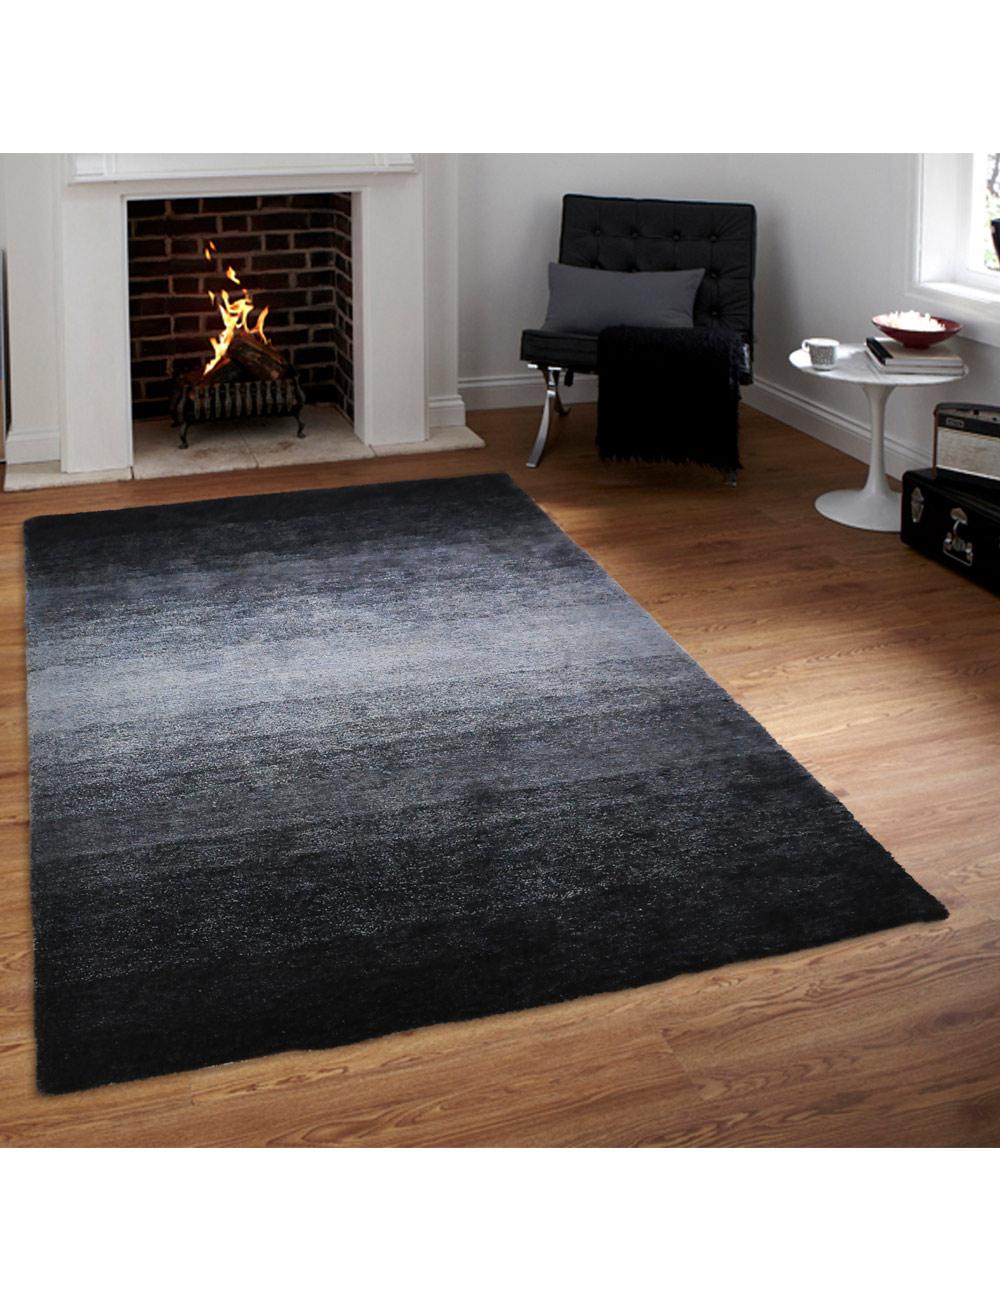 teppich shine schwarz grau 120 x 170 cm. Black Bedroom Furniture Sets. Home Design Ideas